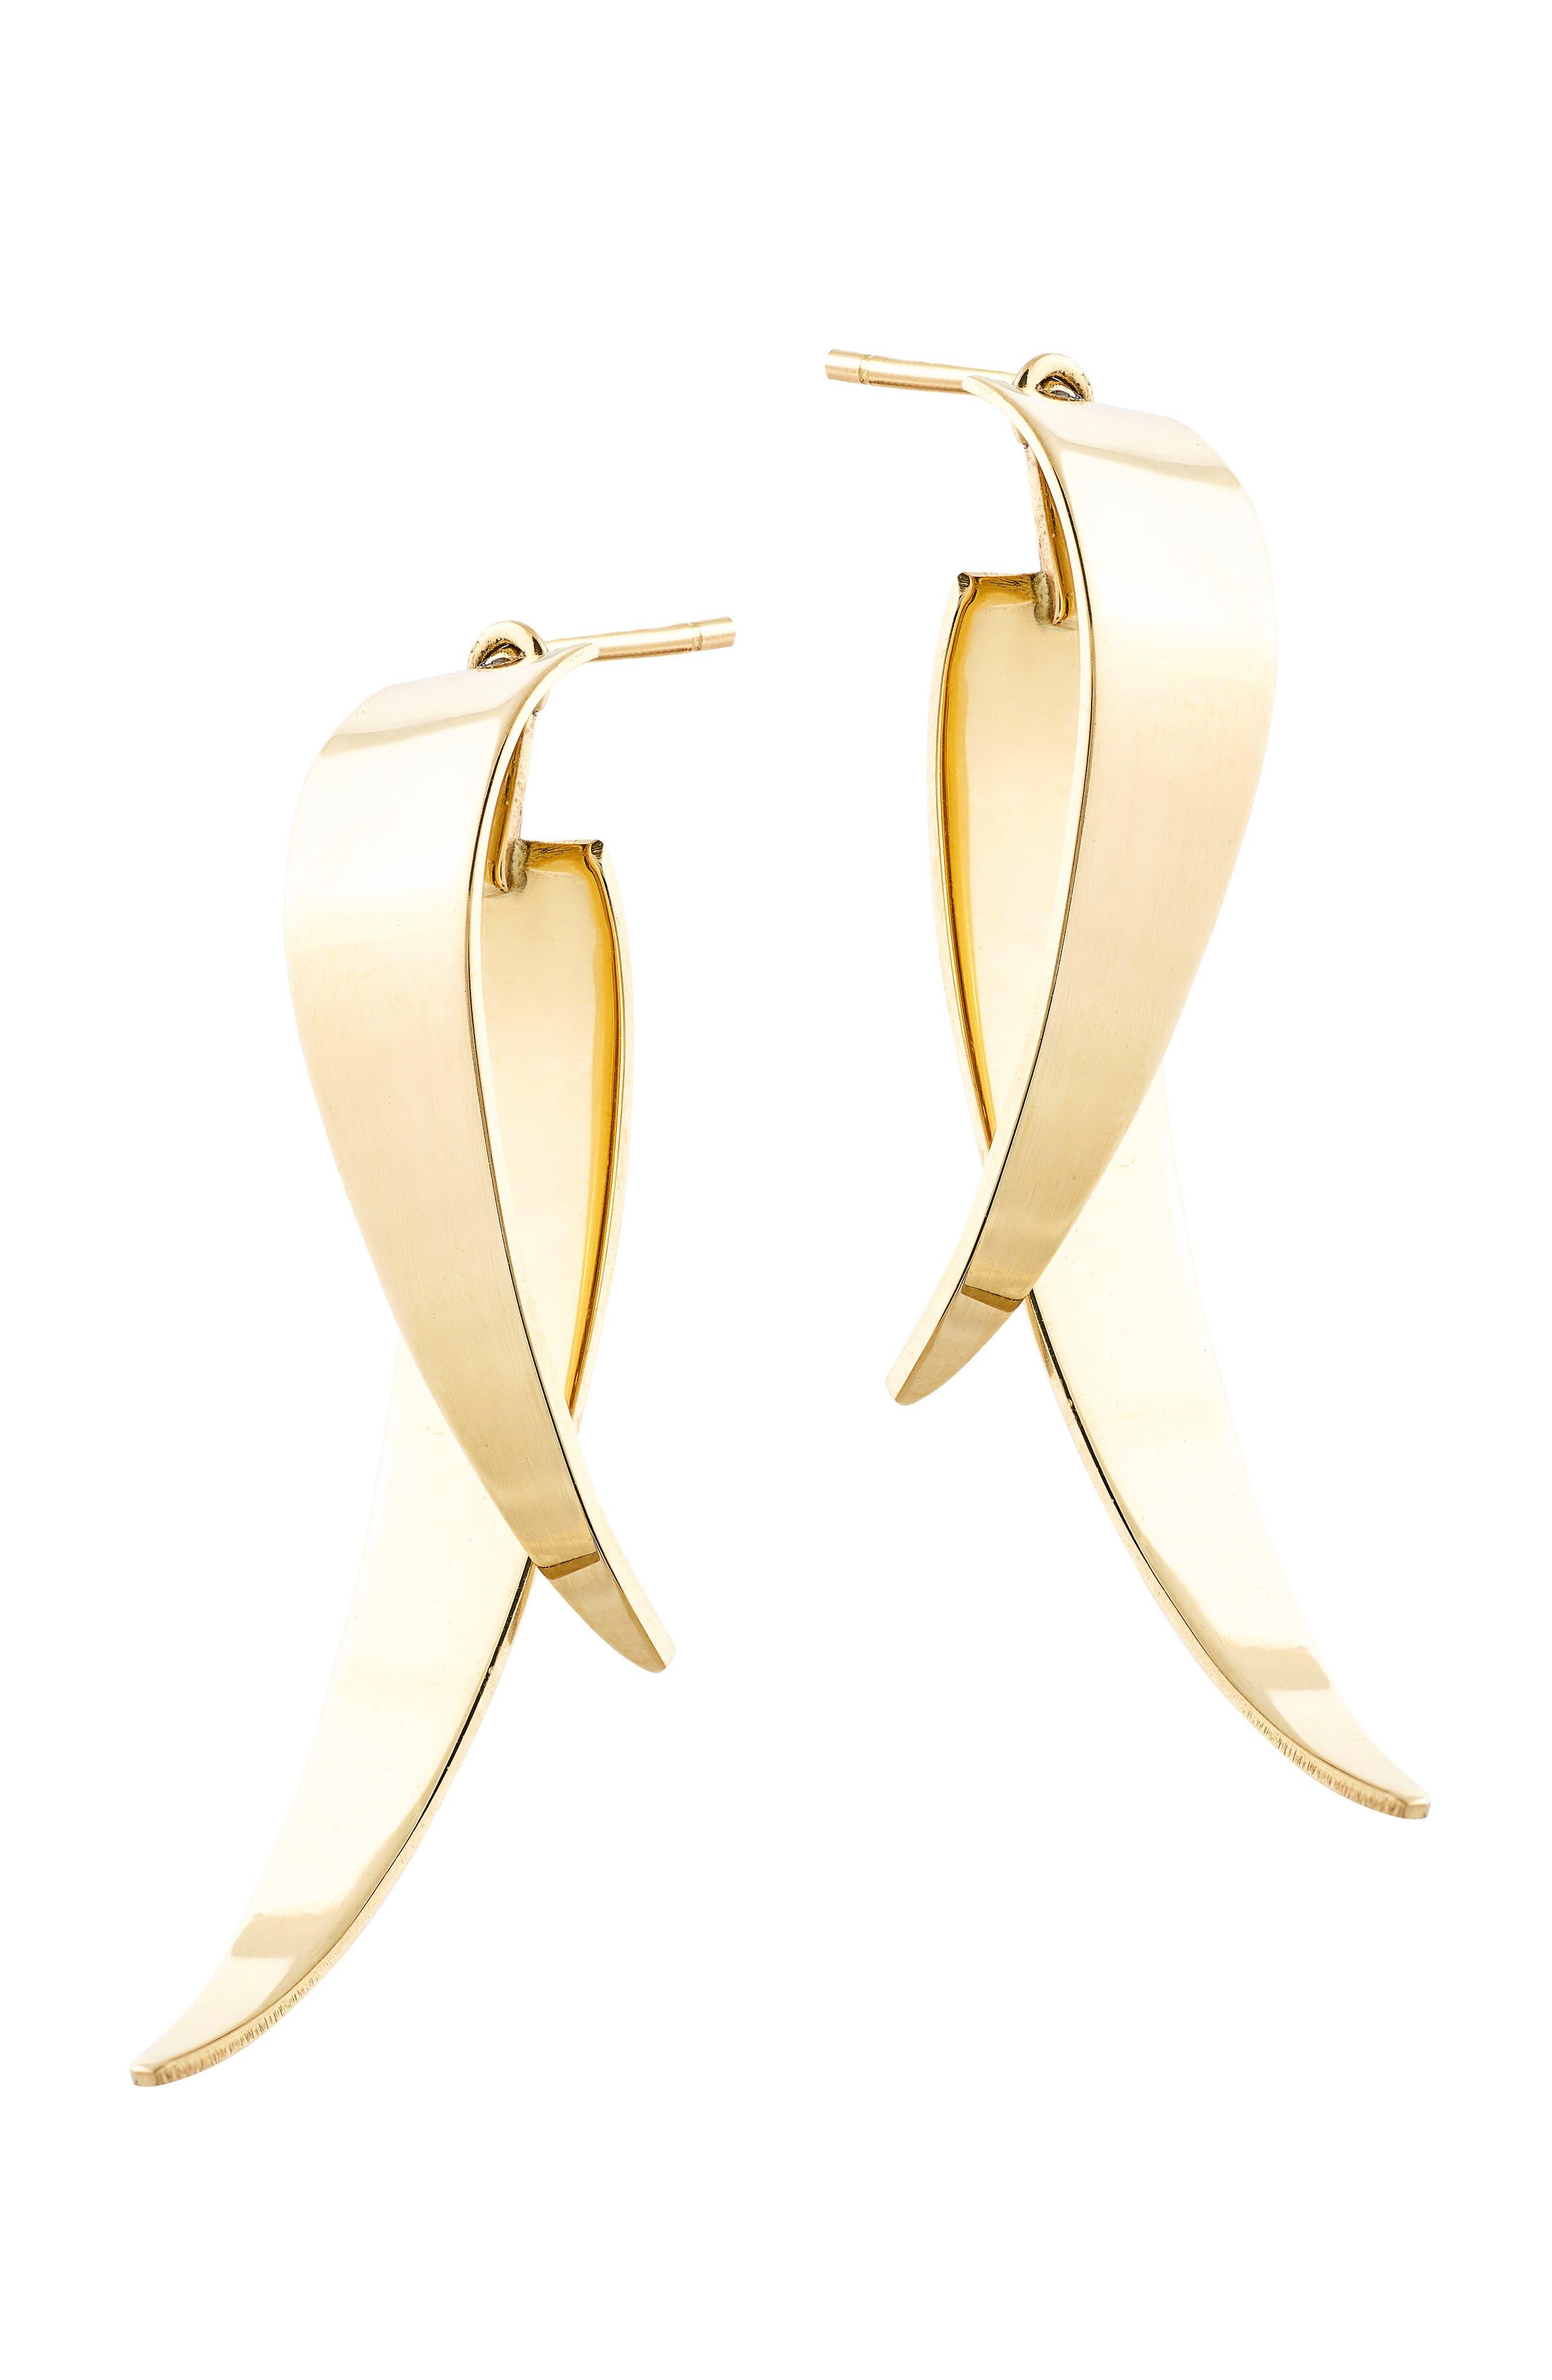 Main Image - Lana Jewelry Bond Double Dagger Stud Earrings